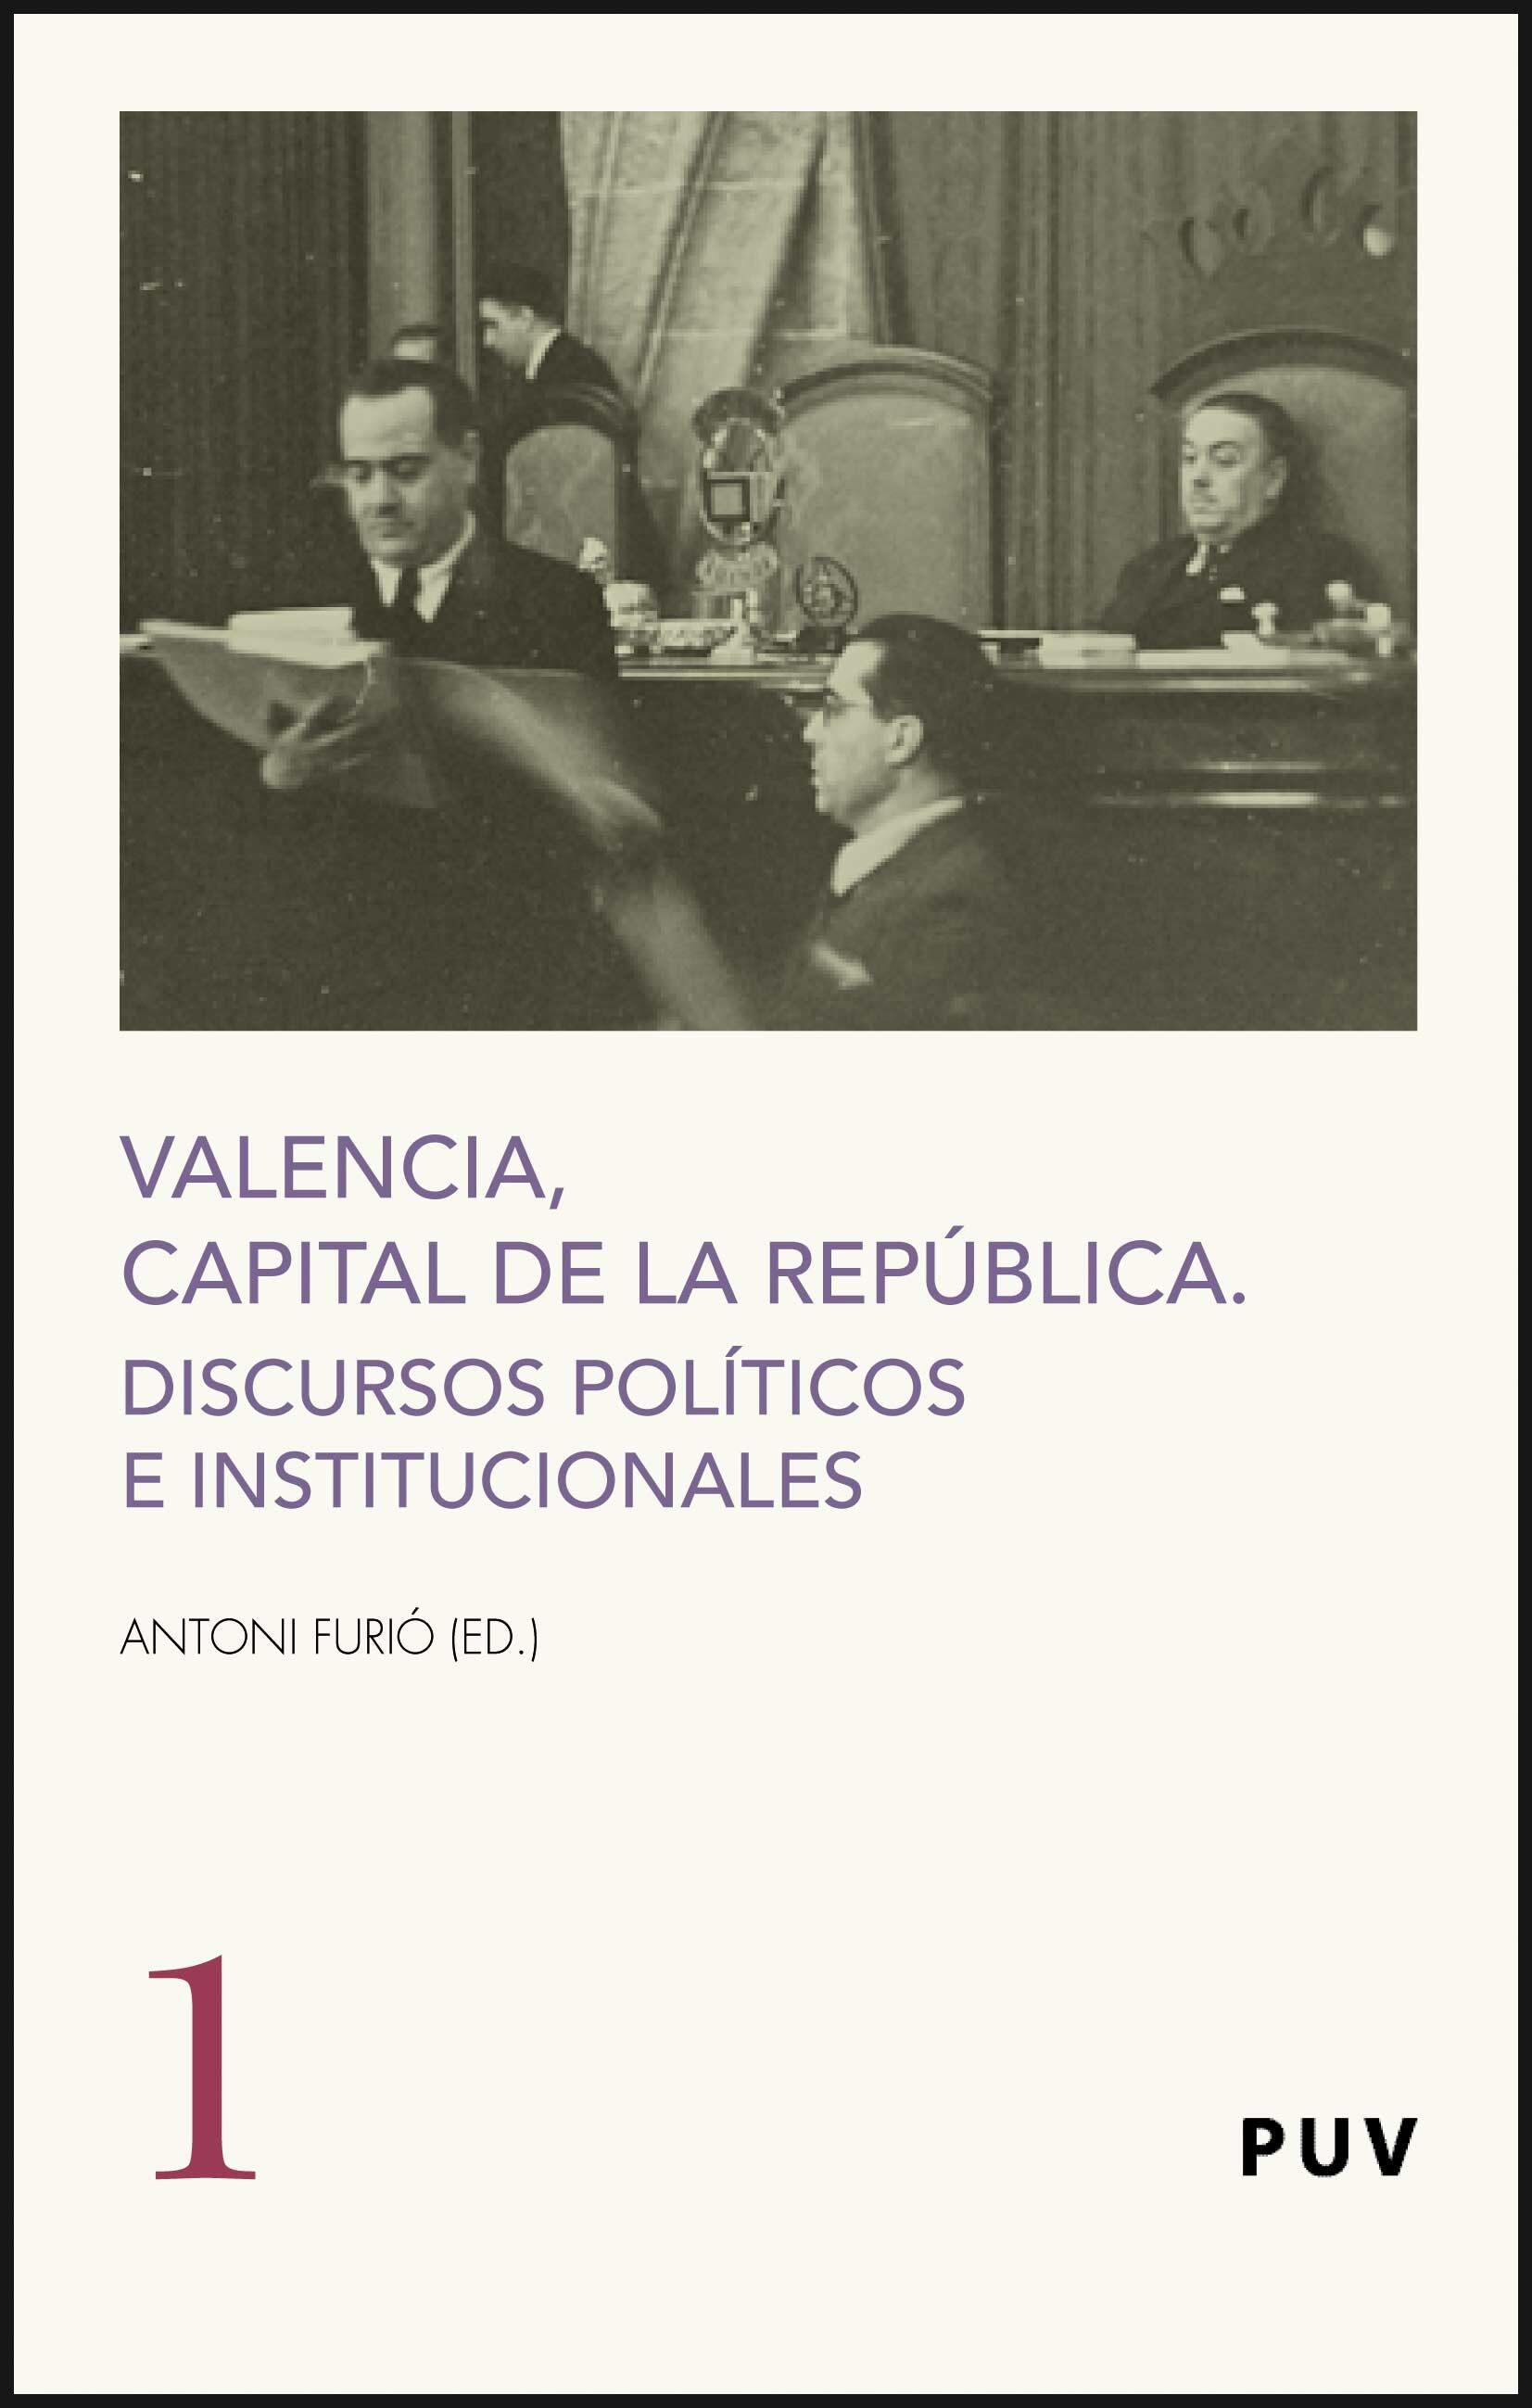 Valencia Capital De La Republica: Discursos Politicos E Instituci Onal - Furio Antonio